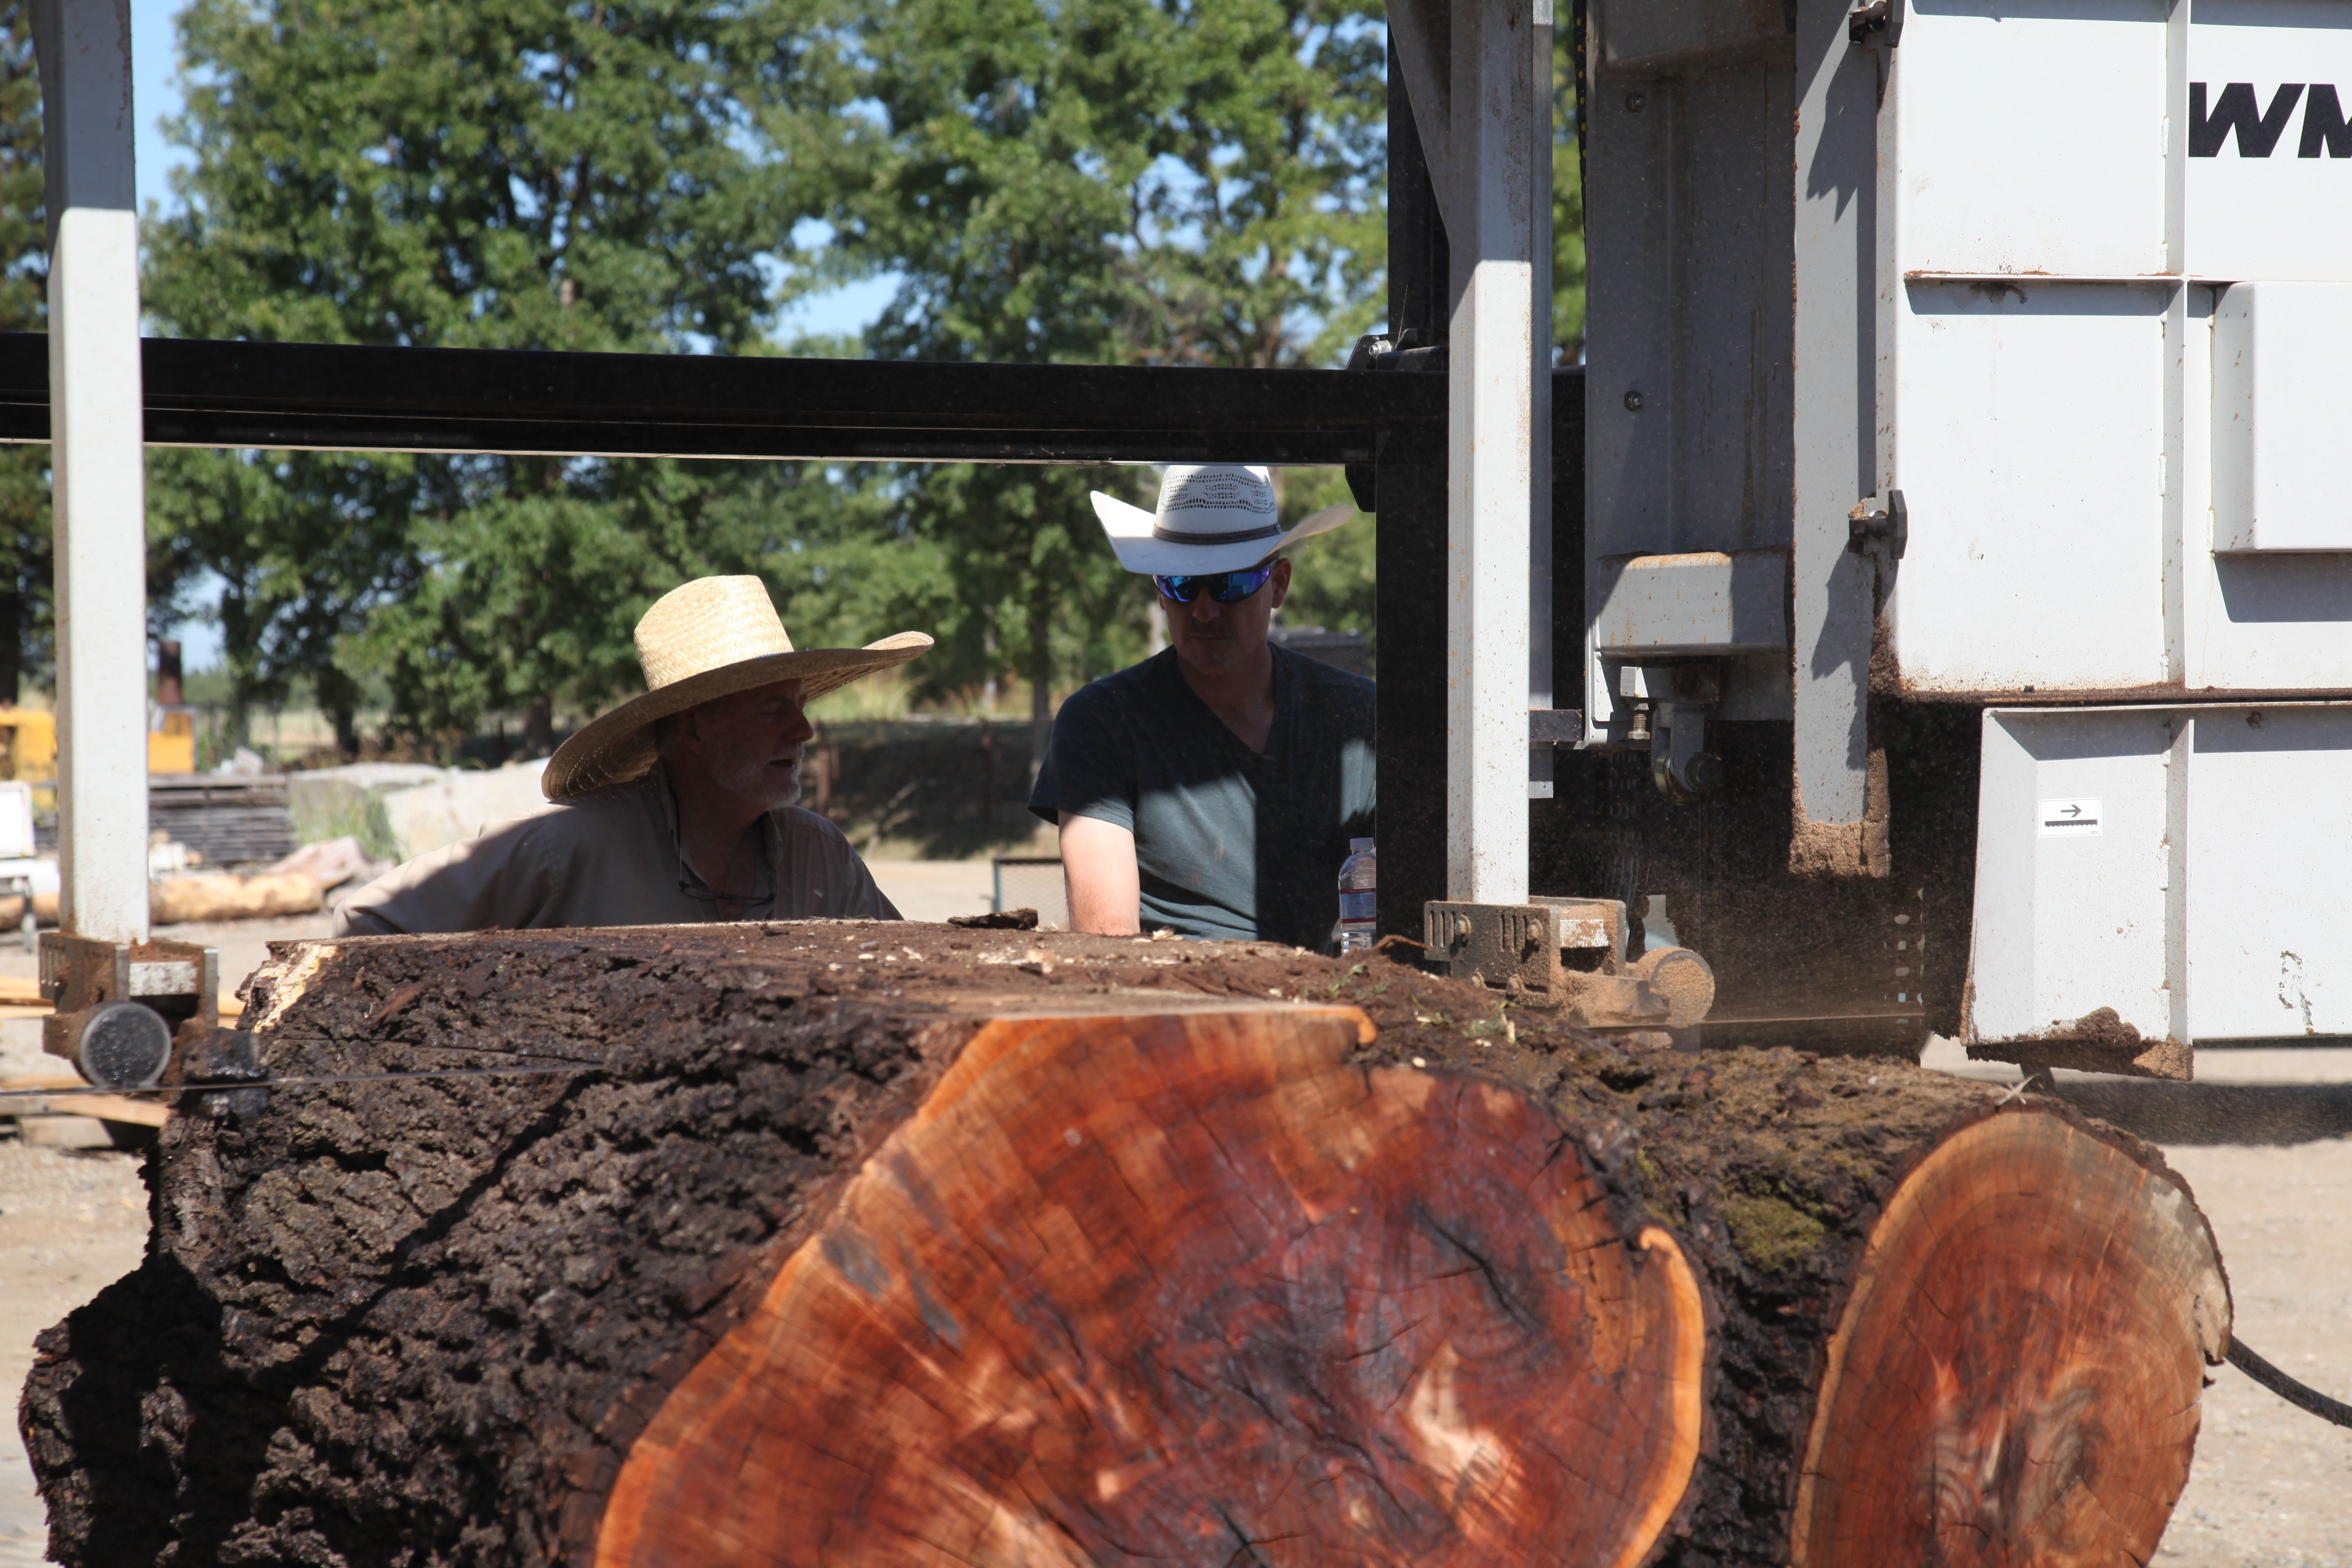 Milling a Walnut crotch on the Wood-Mizer WM1000 sawmill